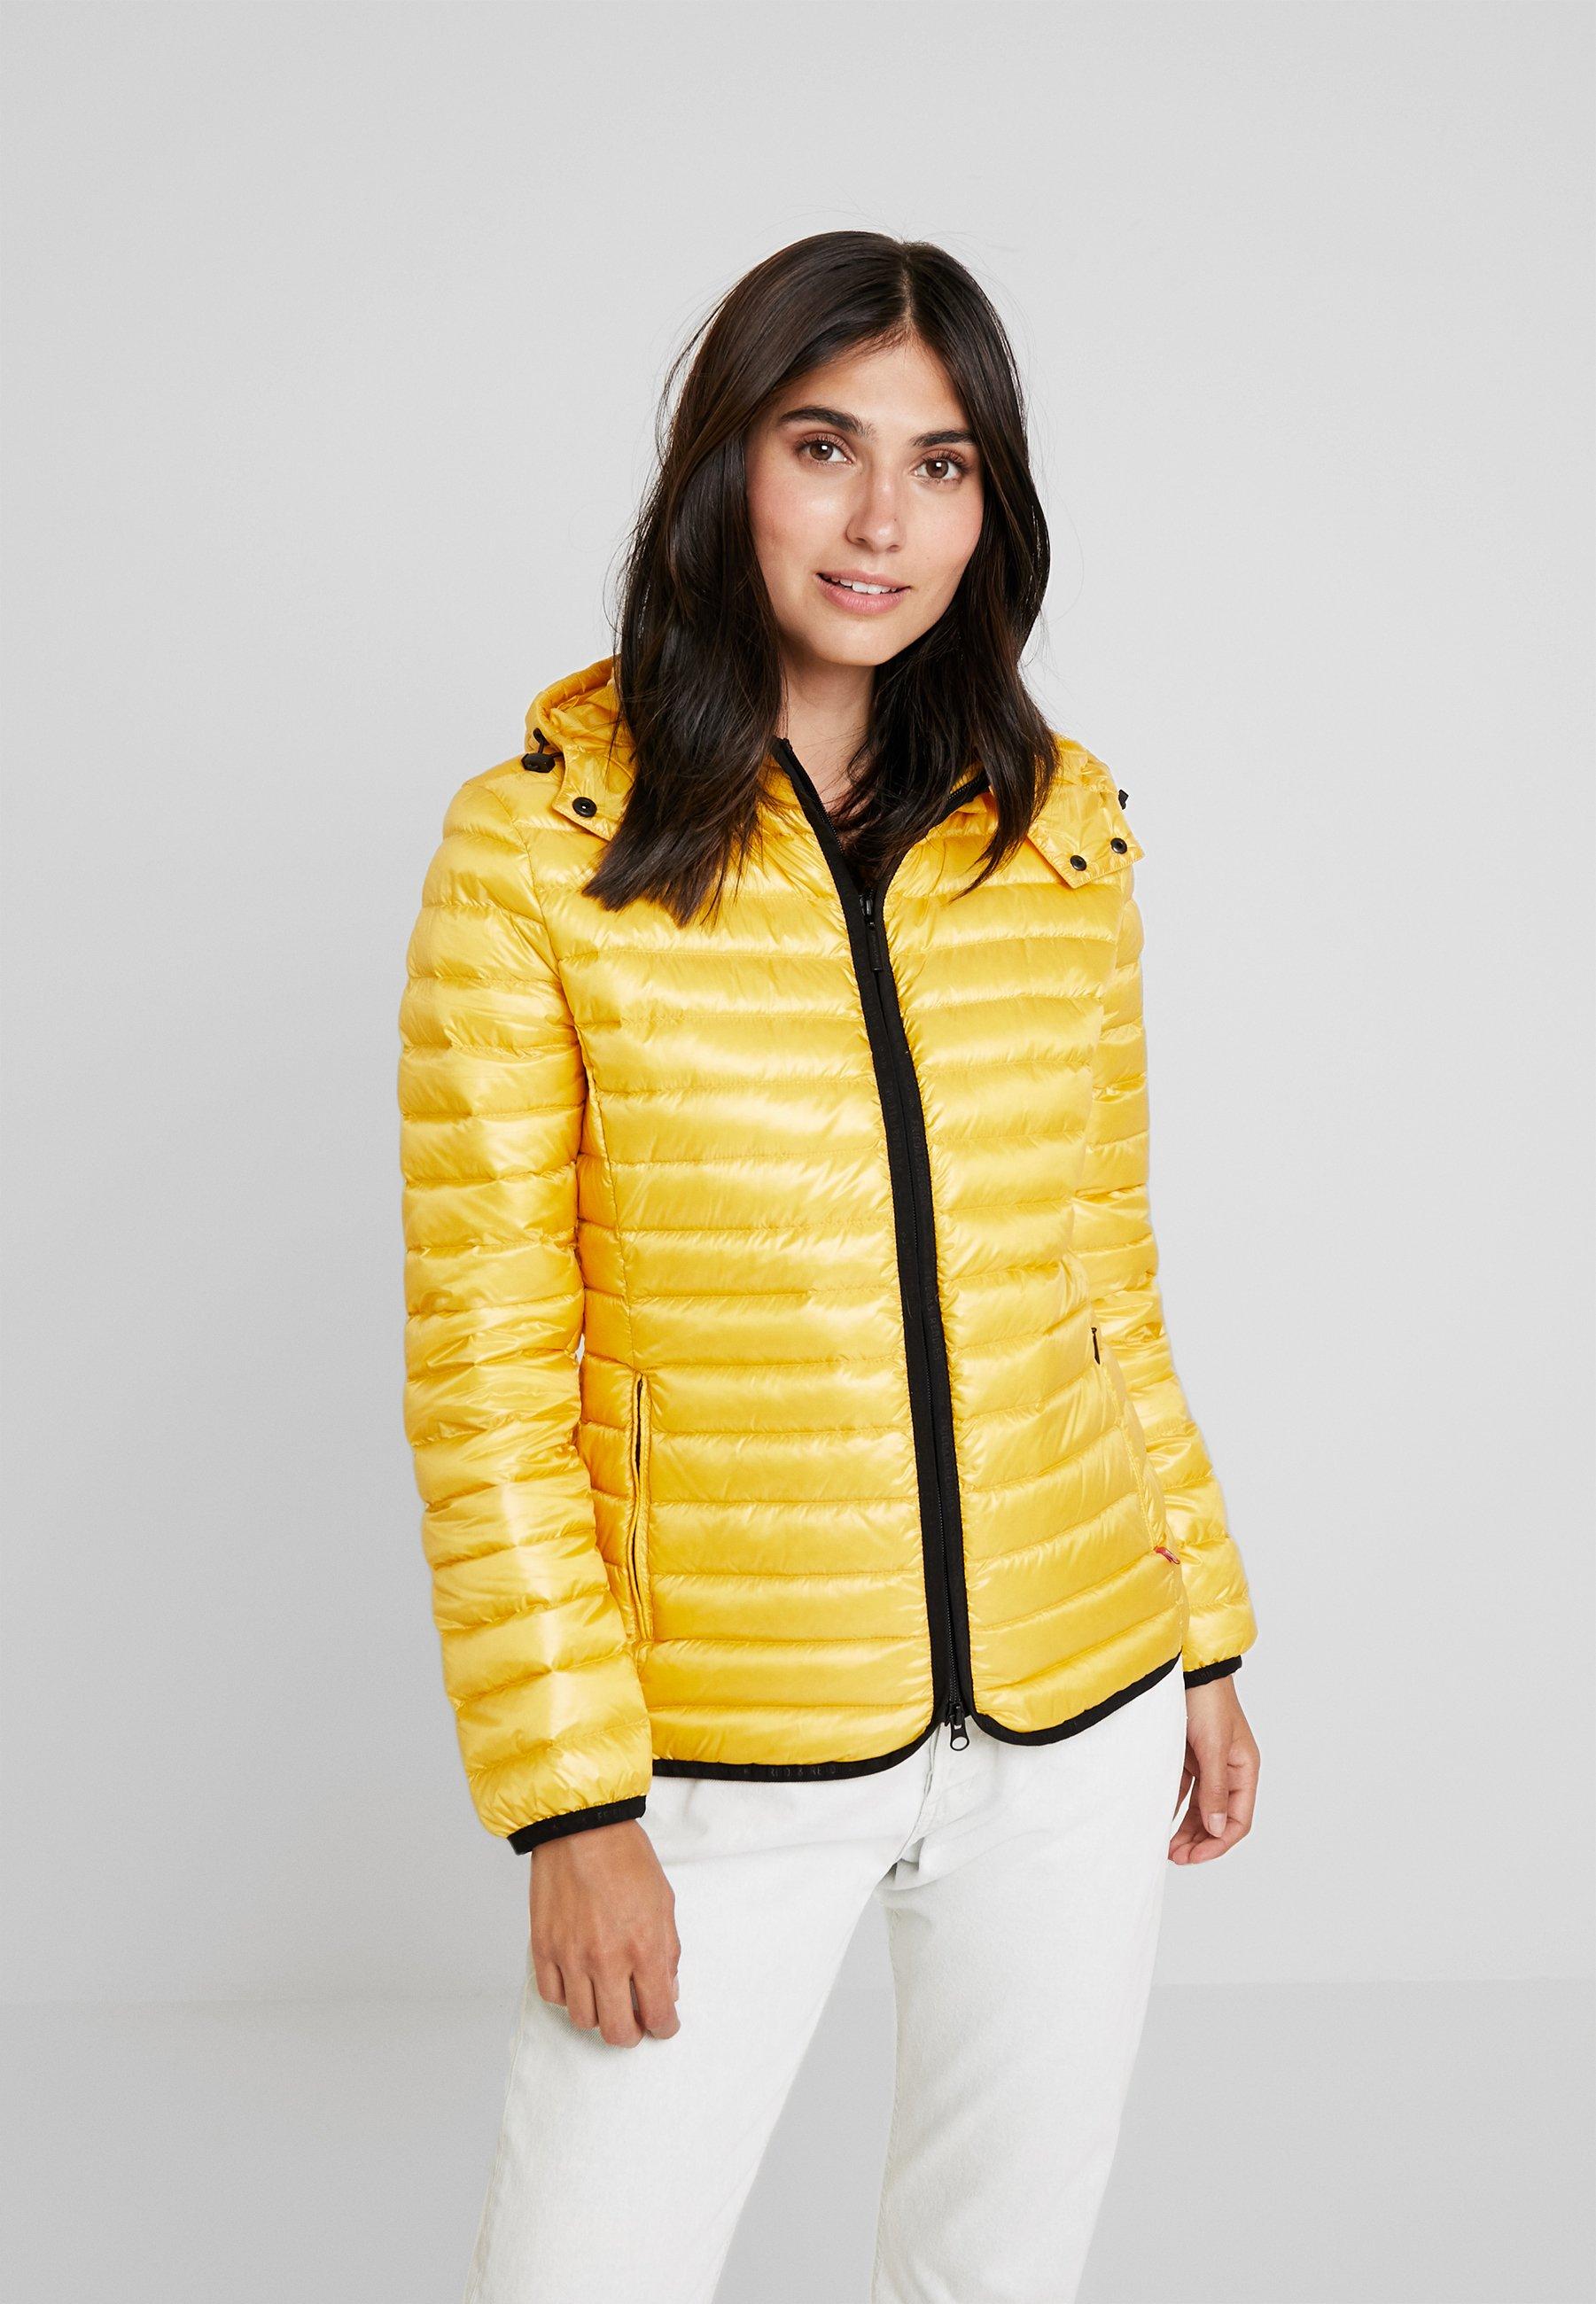 Friedaamp; Golden Freddies JacketDoudoune JacketDoudoune Friedaamp; Yellow Freddies Golden Yellow WQrCBExedo